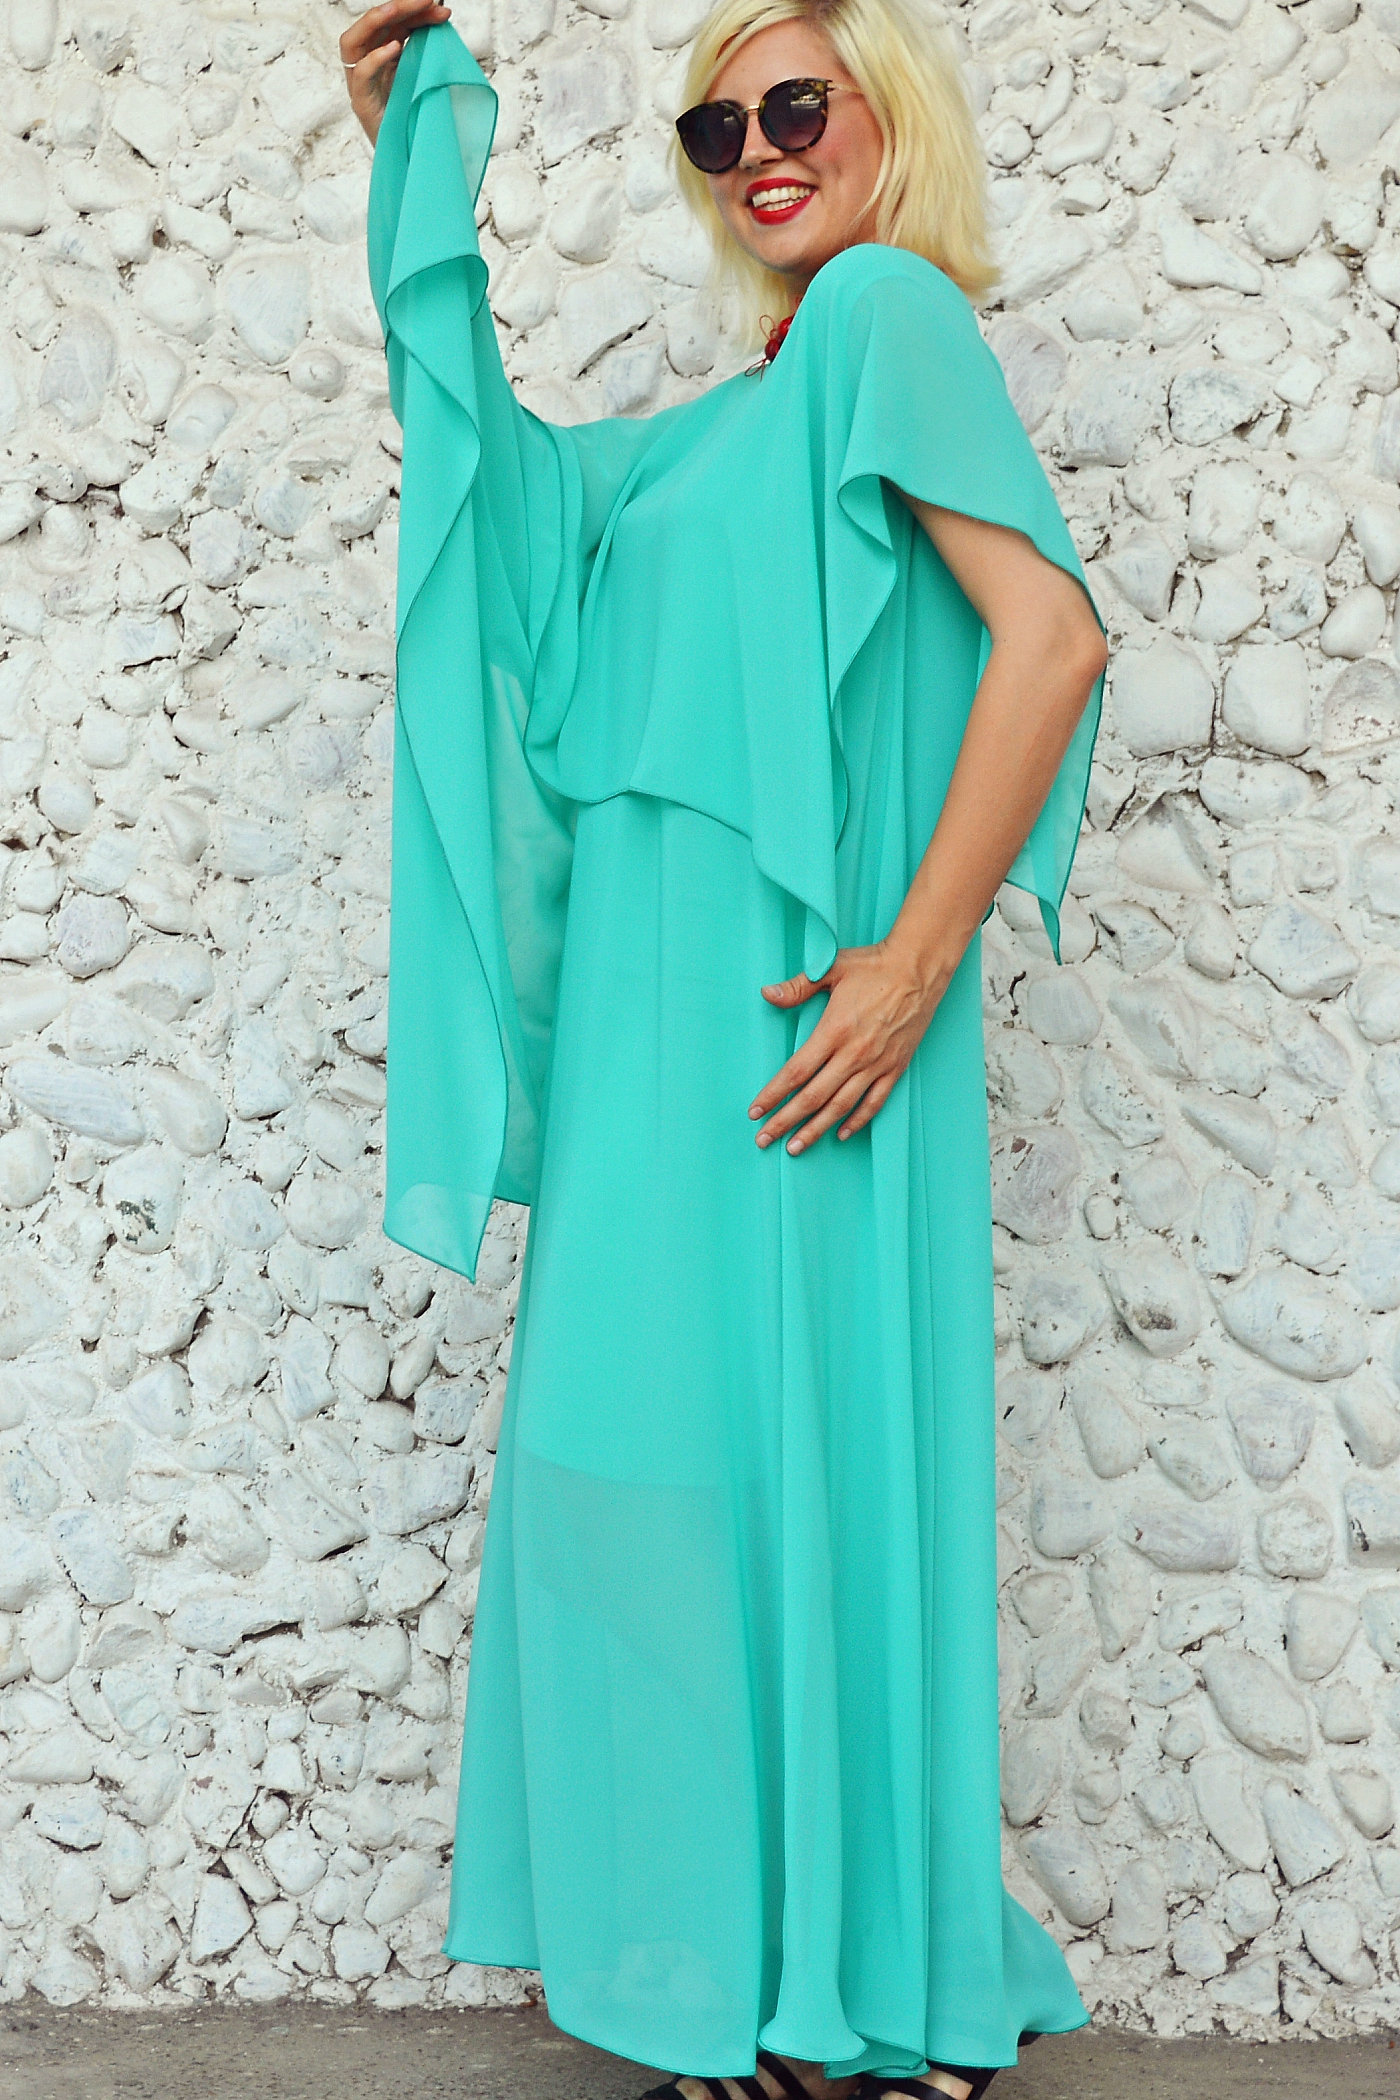 TEYXO | Clothing Store for Women | Turquoise Extravagant Kaftan ...